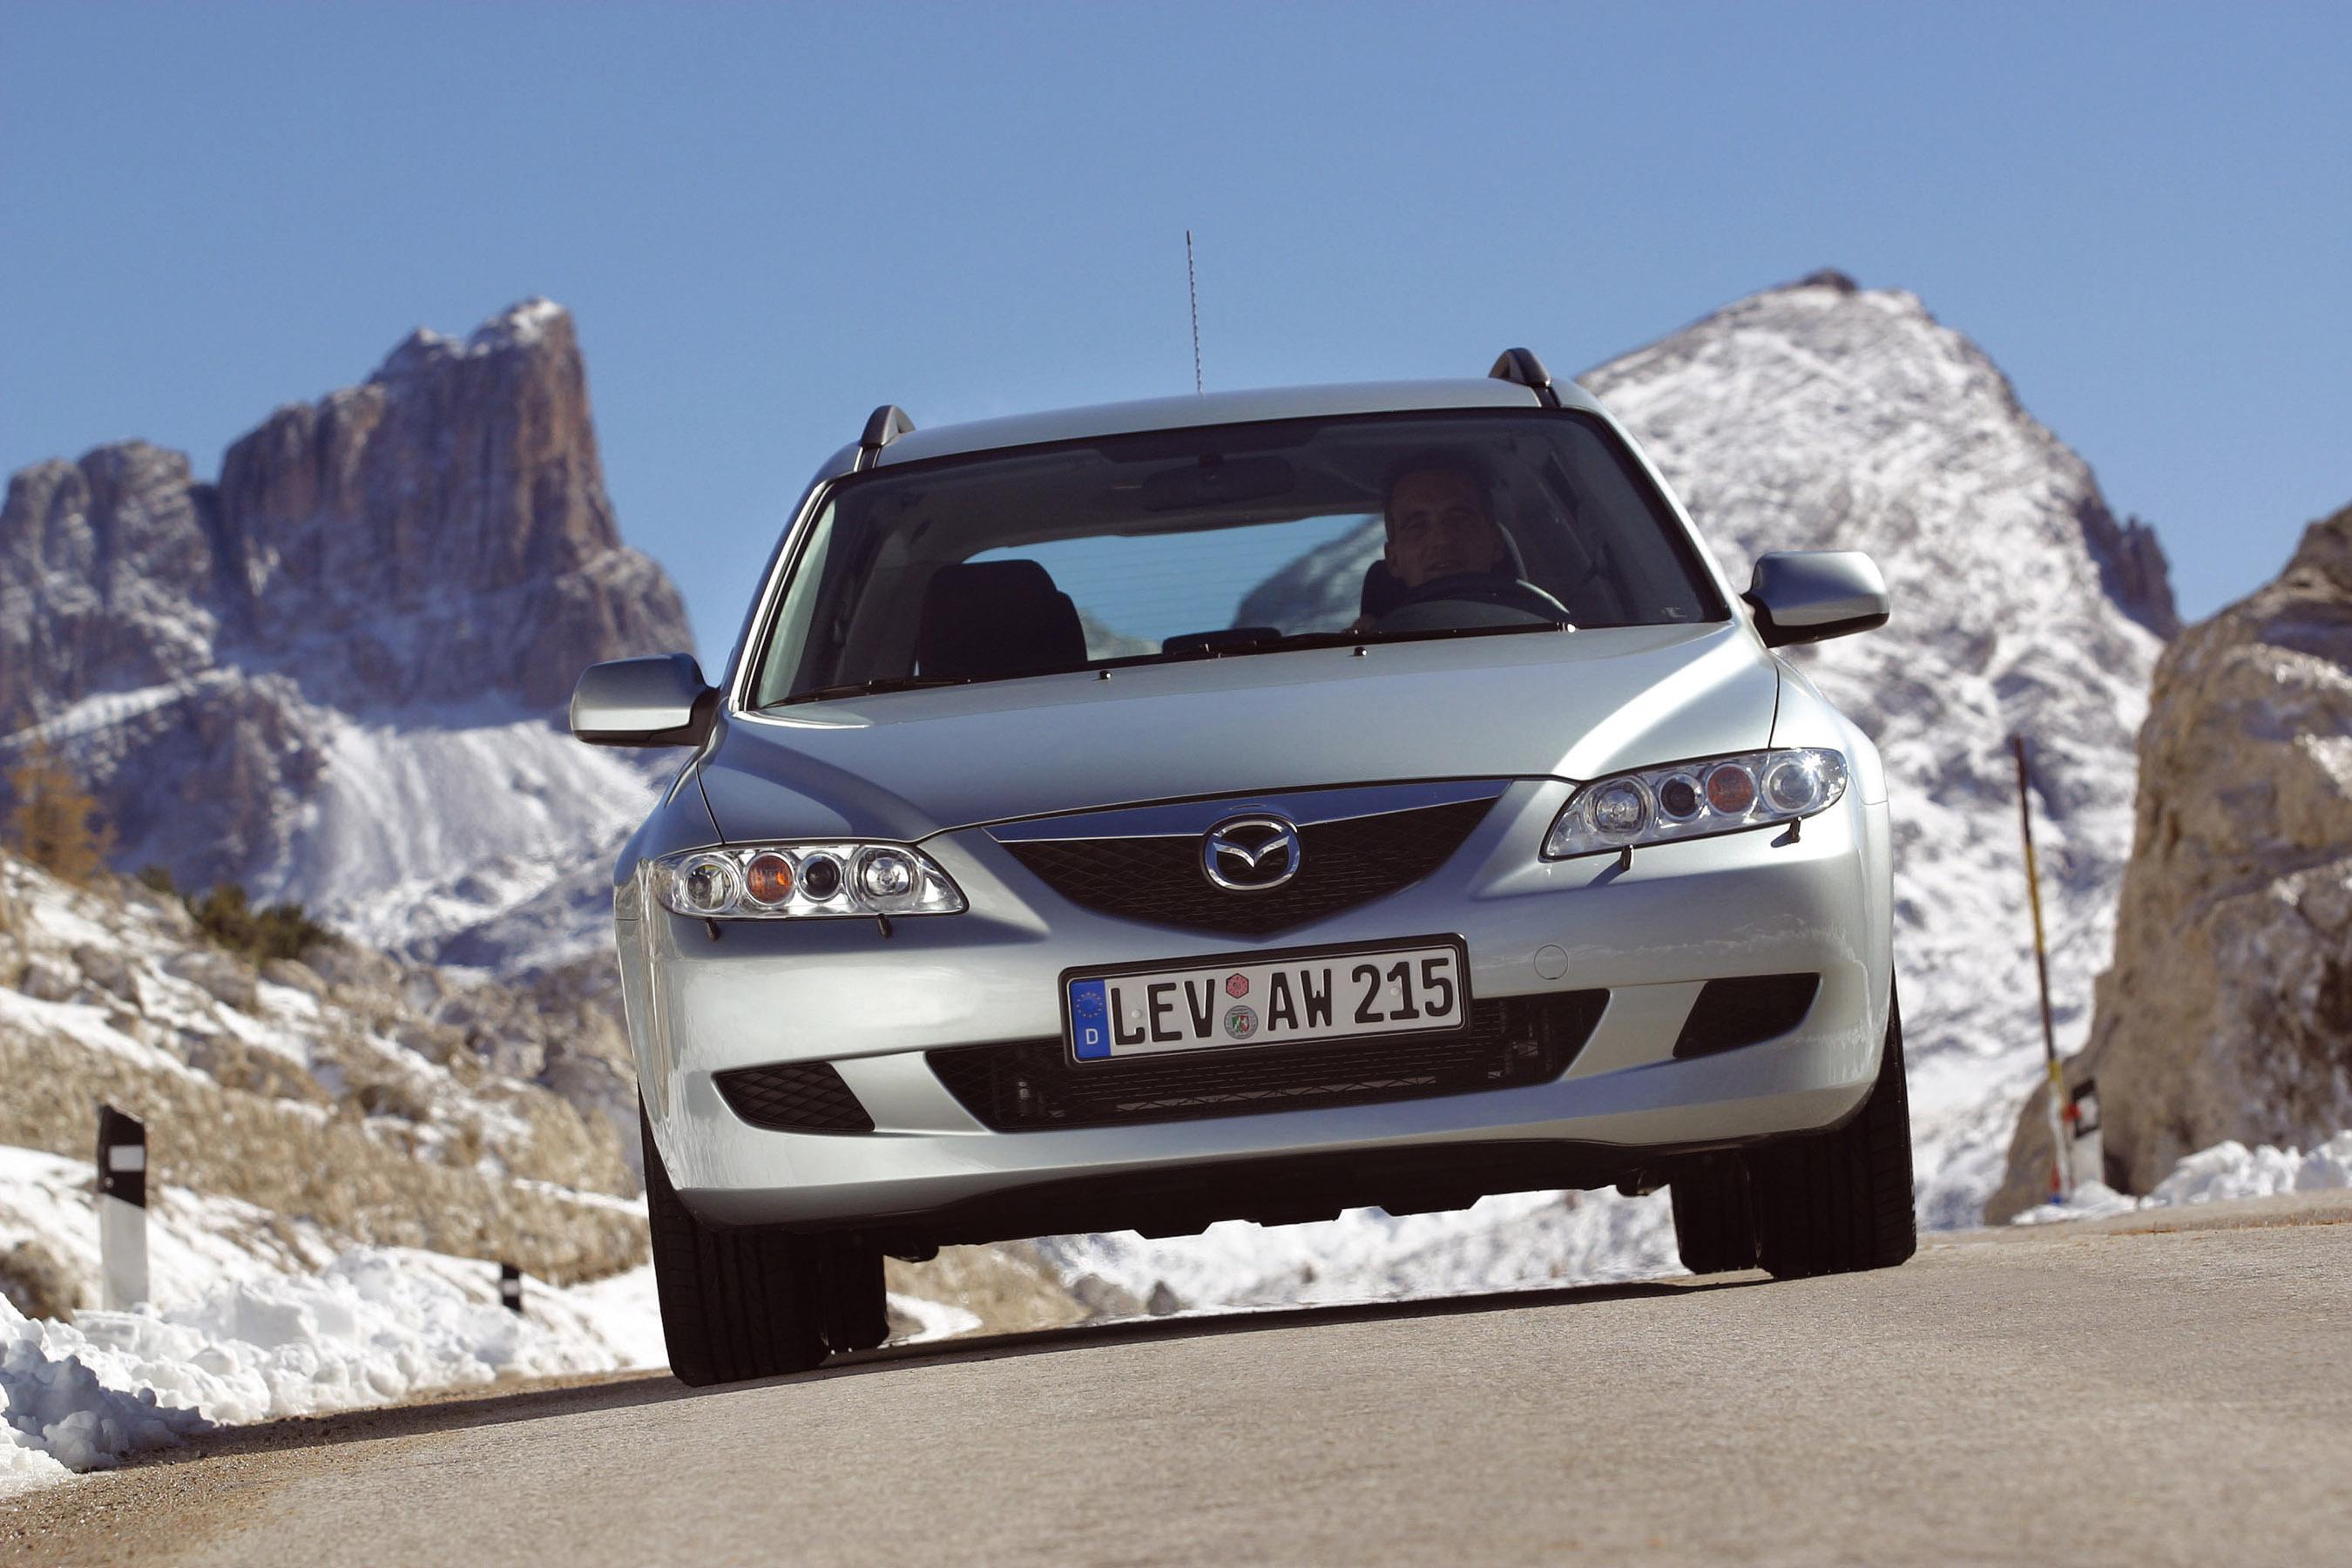 2002 Mazda 6 AWD - HD Pictures @ carsinvasion.com